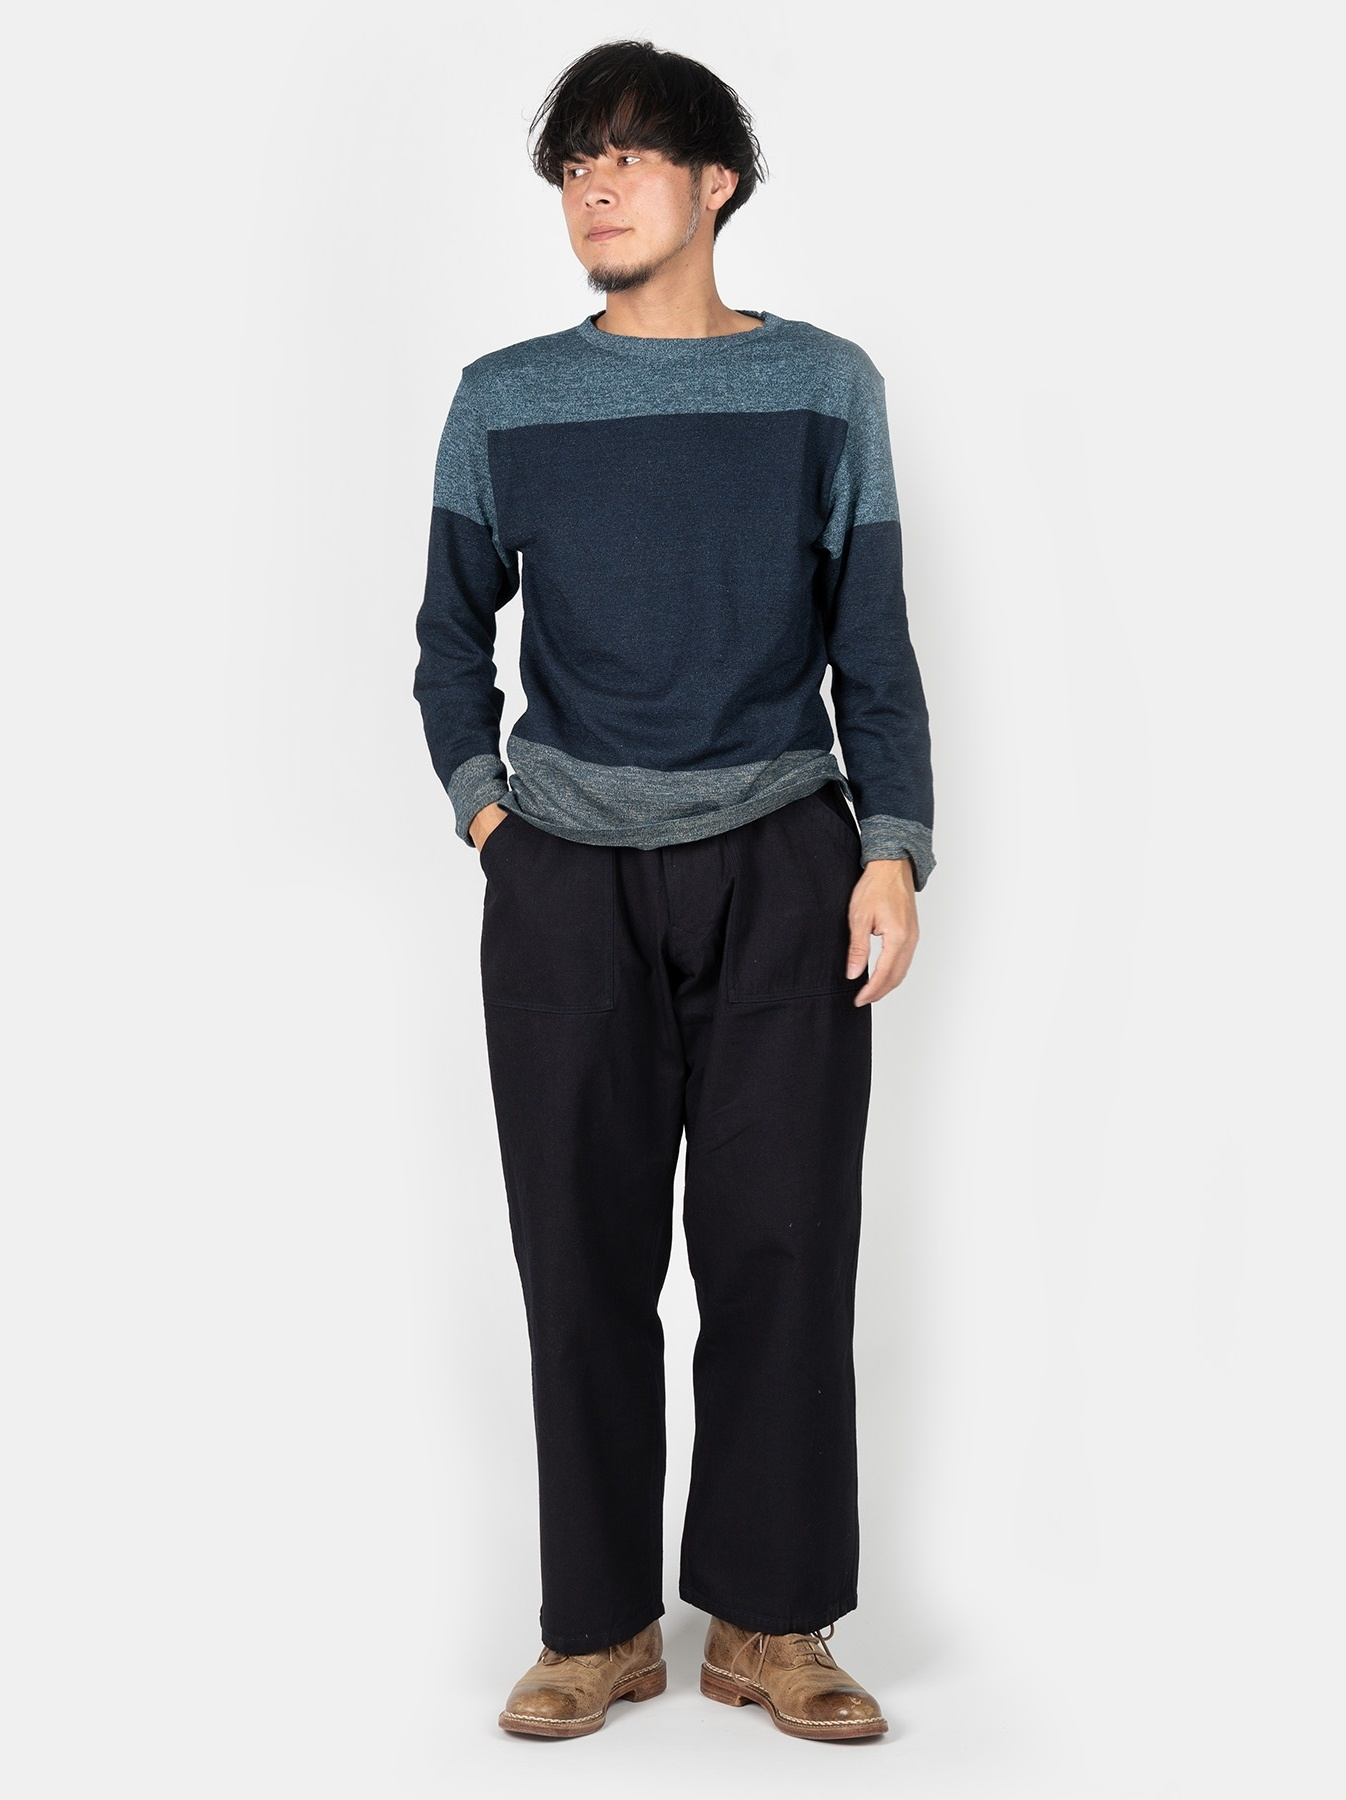 WH Gauze Basque Knit T-shirt-2